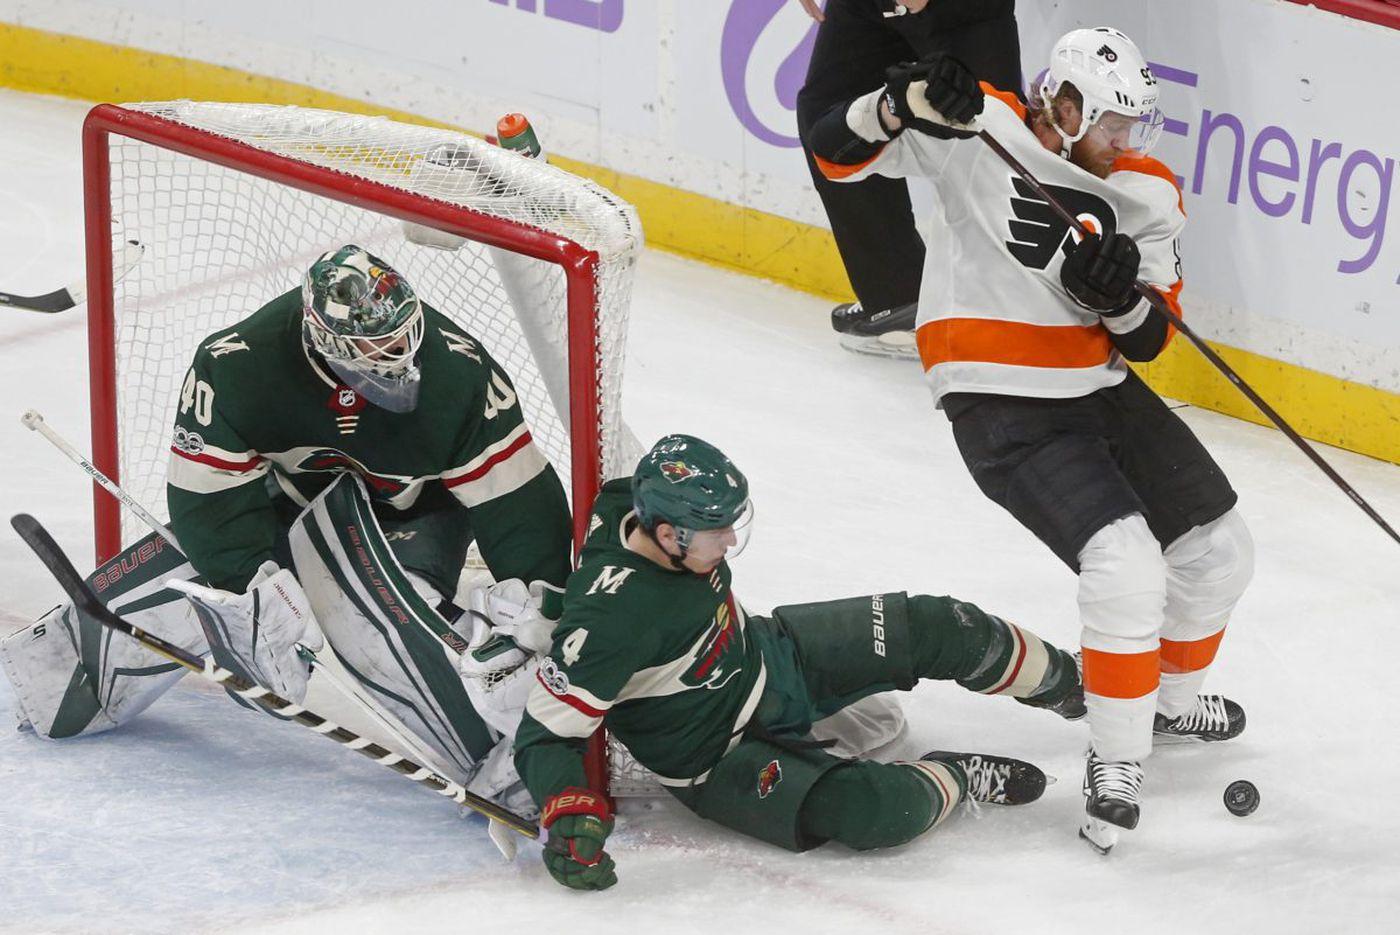 Flyers blanked again by Wild's Devan Dubnyk